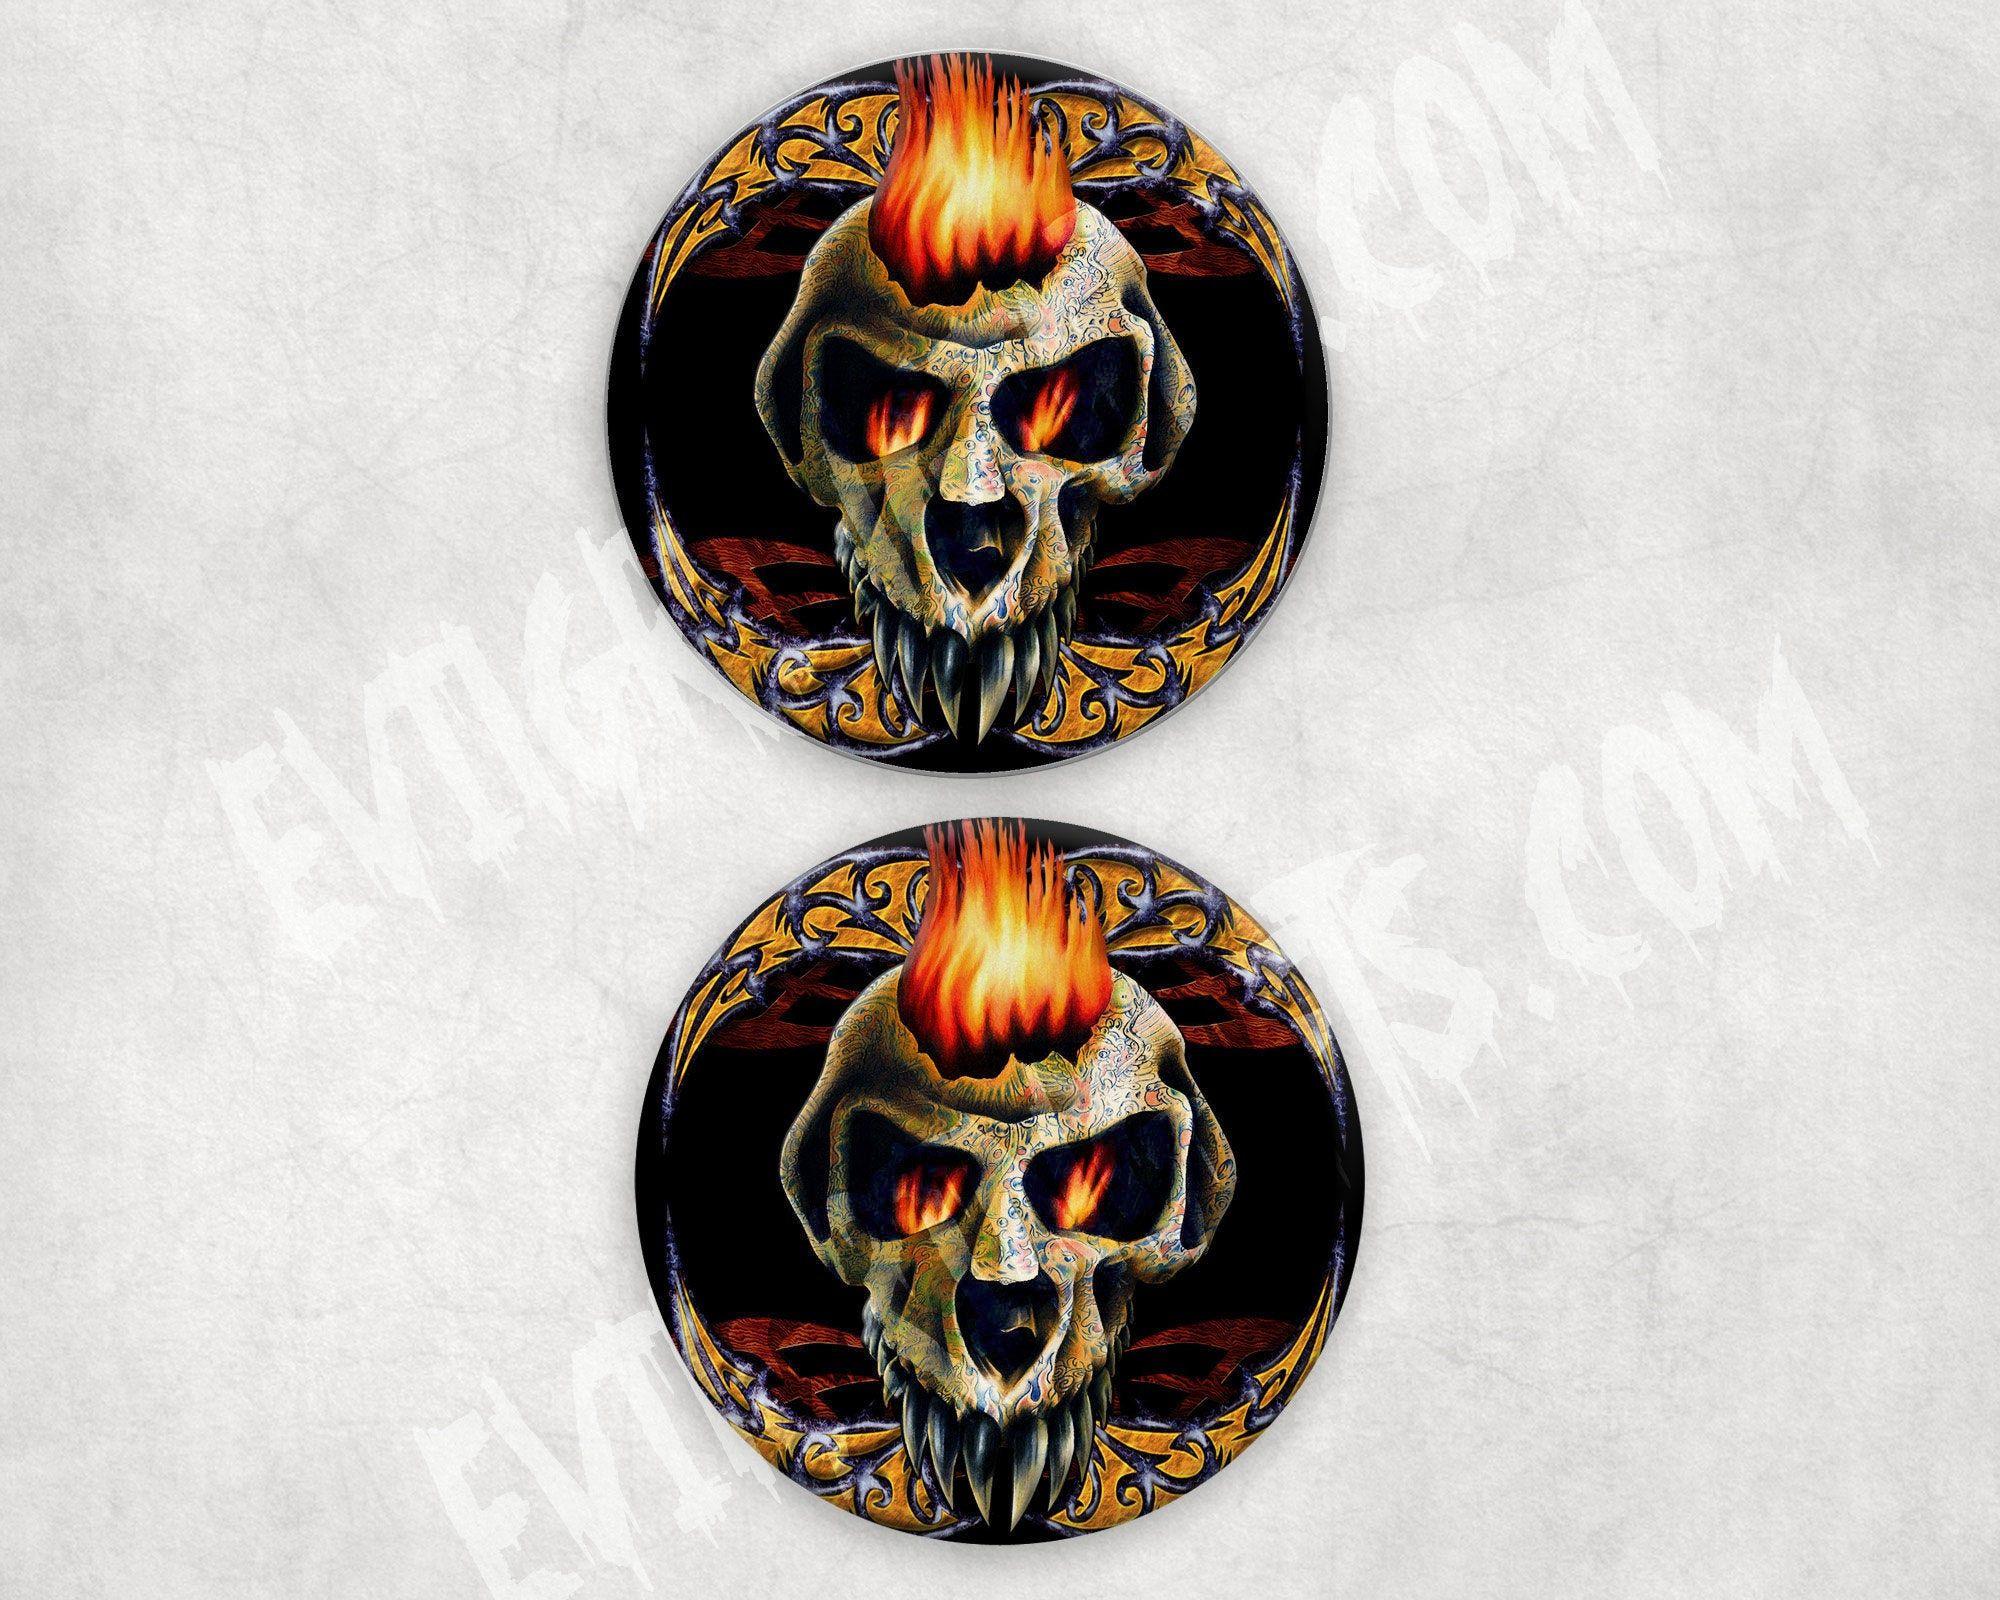 Tattooed Skull Coaster Set Flaming Skull Absorbent Corked